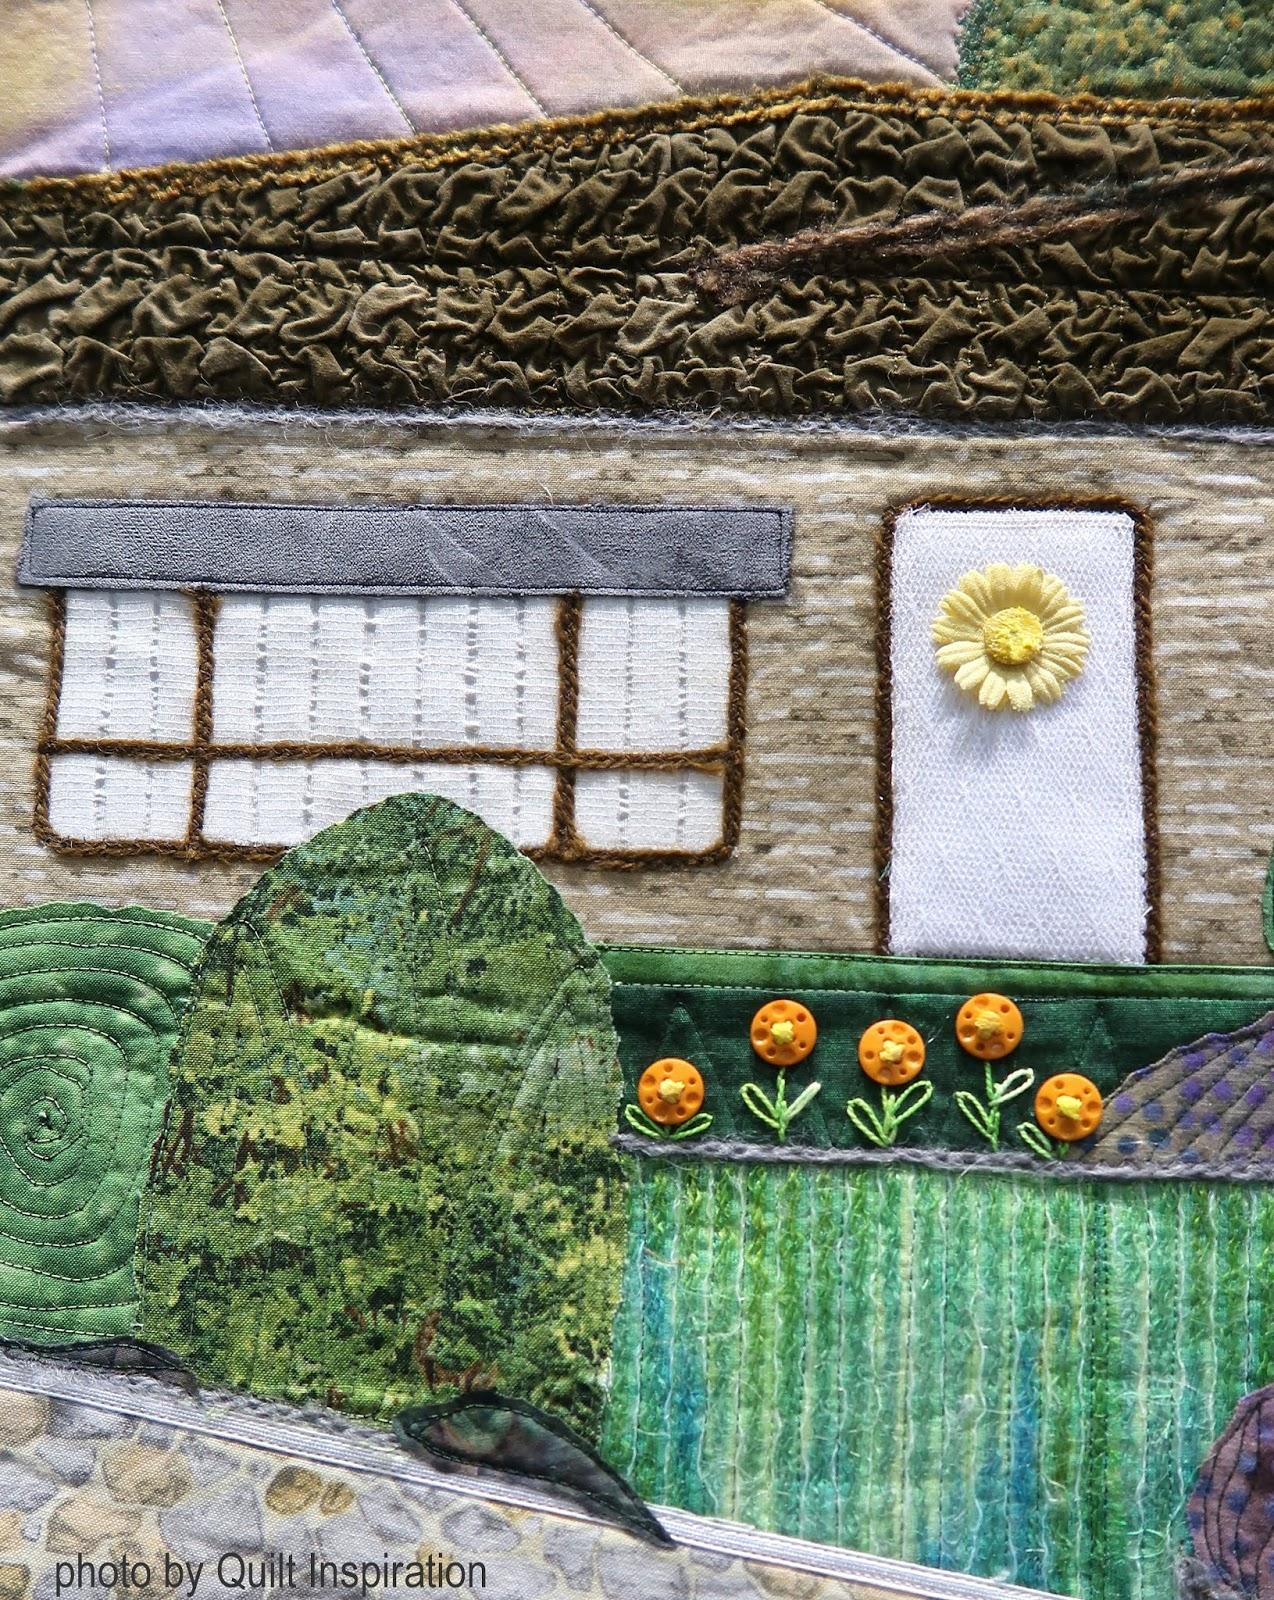 Quilt Inspiration Quilts Celebrating Creativity Part 3